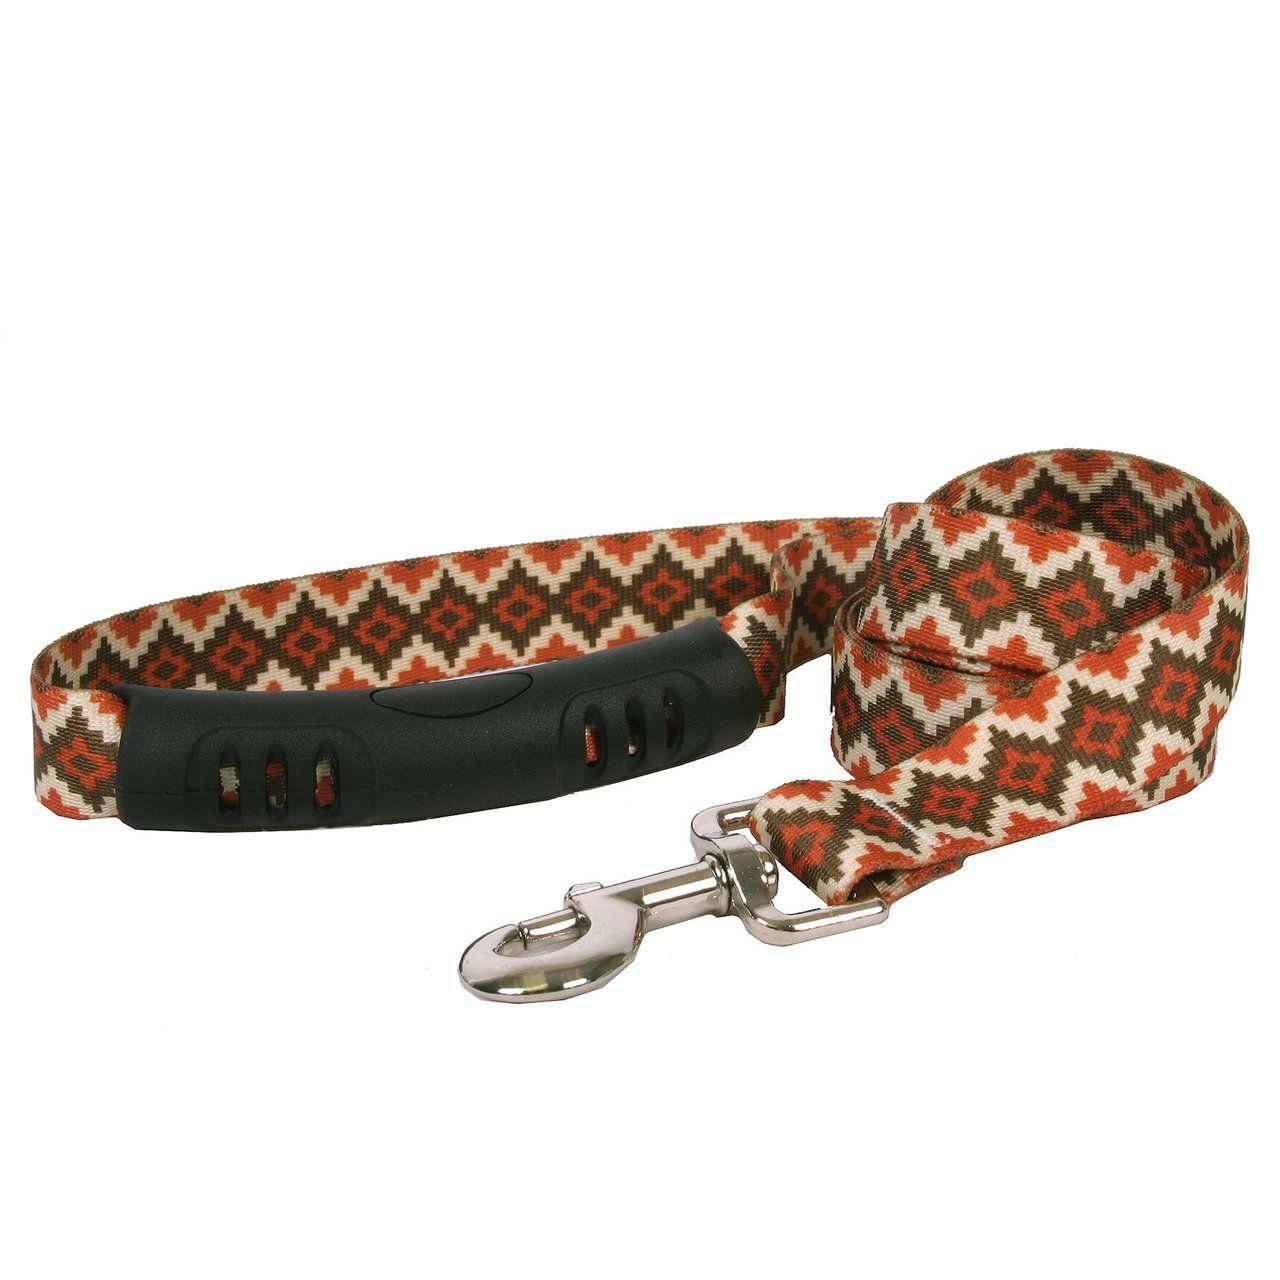 Yellow Dog Design Tie-Dye EZ-Grip Dog Leash-with Comfort Handle